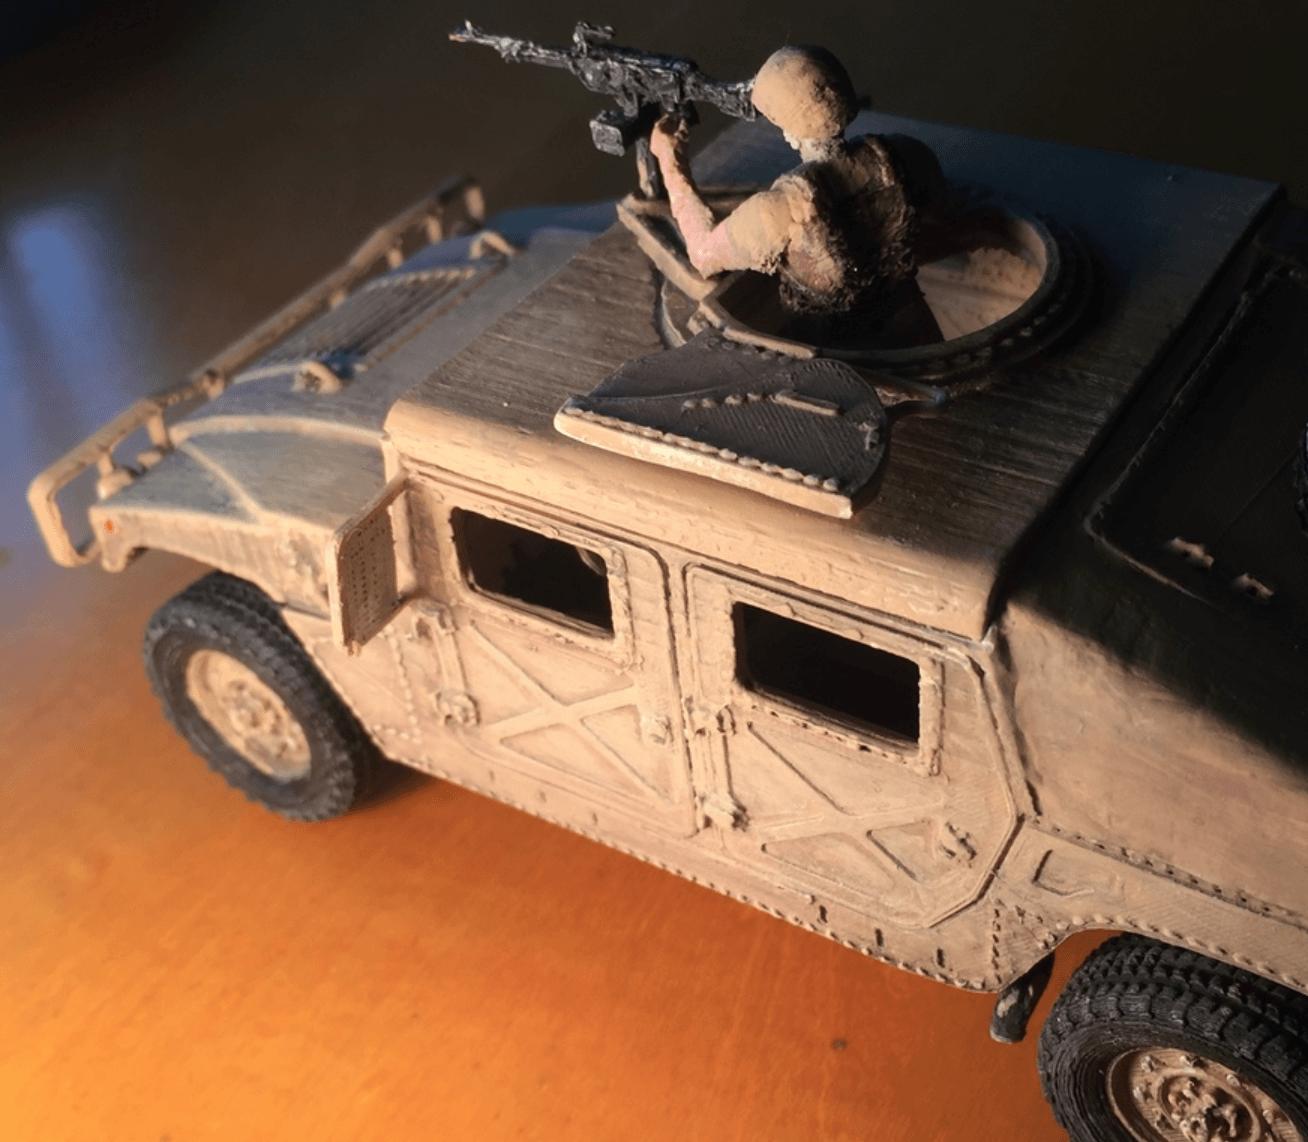 Capture d'écran 2018-03-30 à 16.08.41.png Download STL file HUMMER H1 - Assembly model kit 1:35 • 3D print model, guillesilvestrini